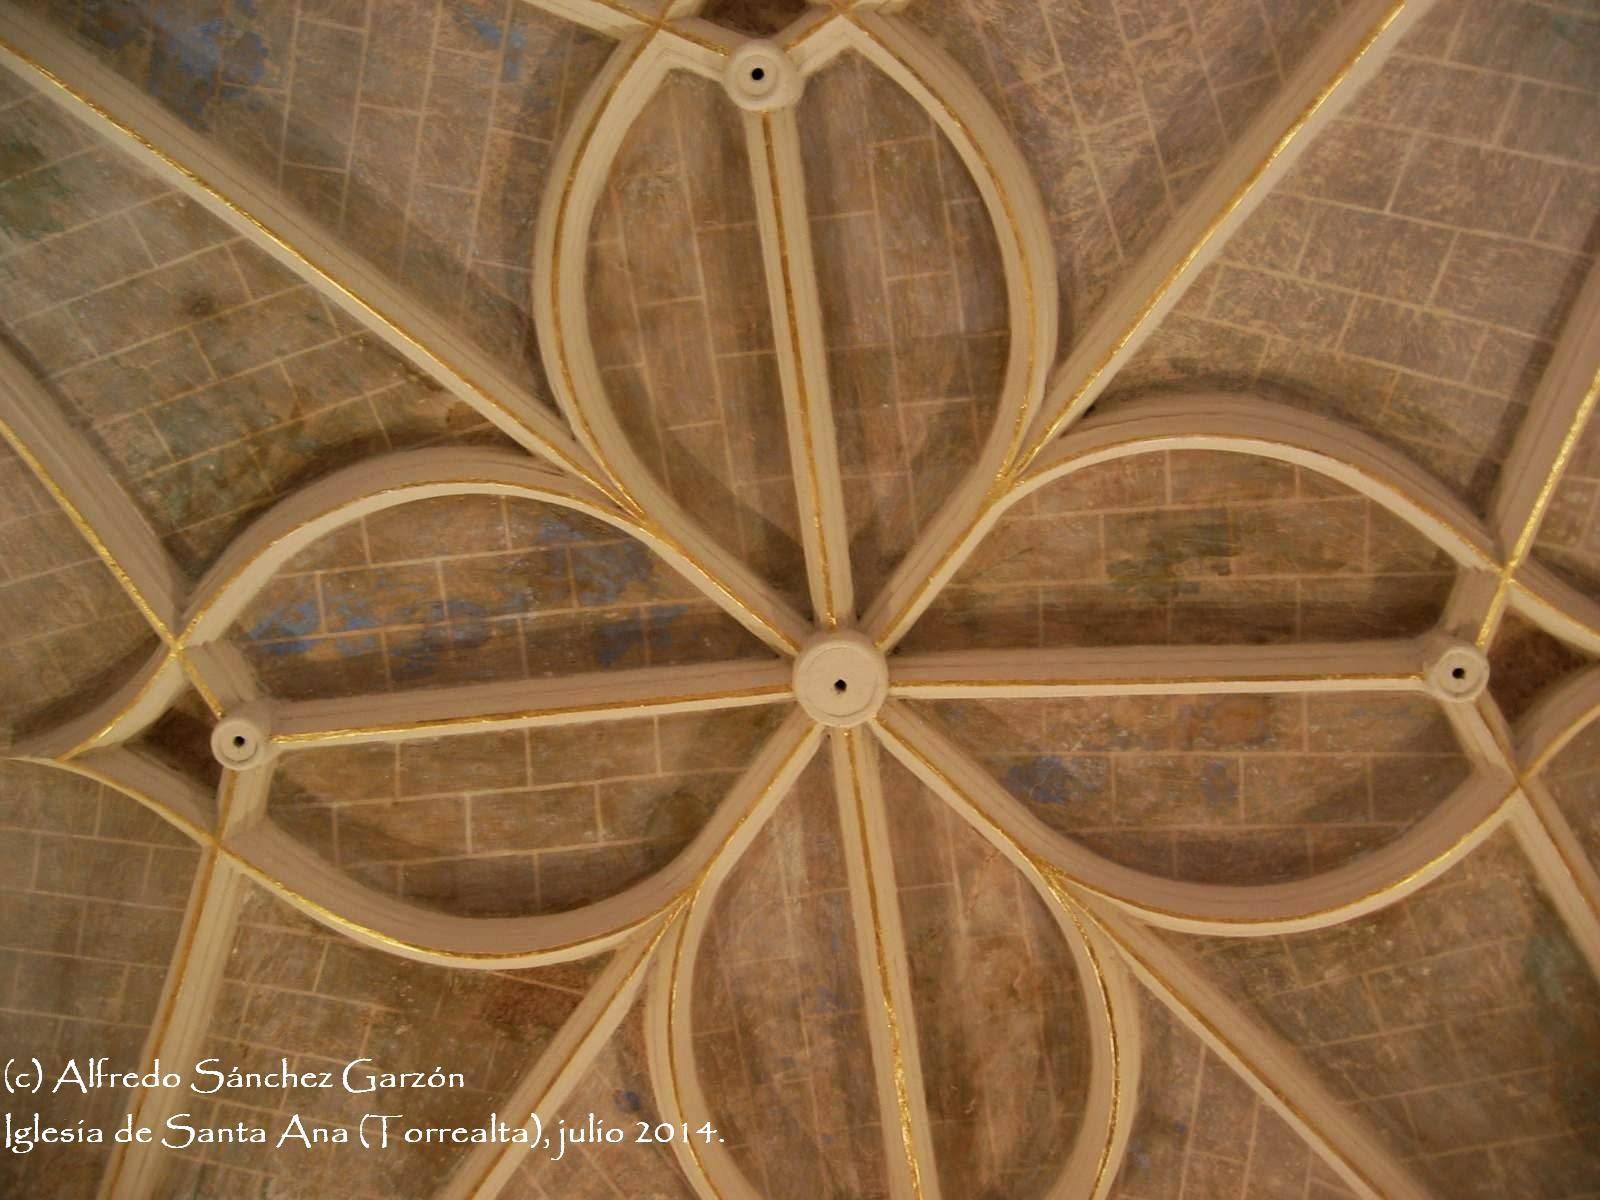 iglesia-santa-ana-torrealta-cupula-traceria-gotica